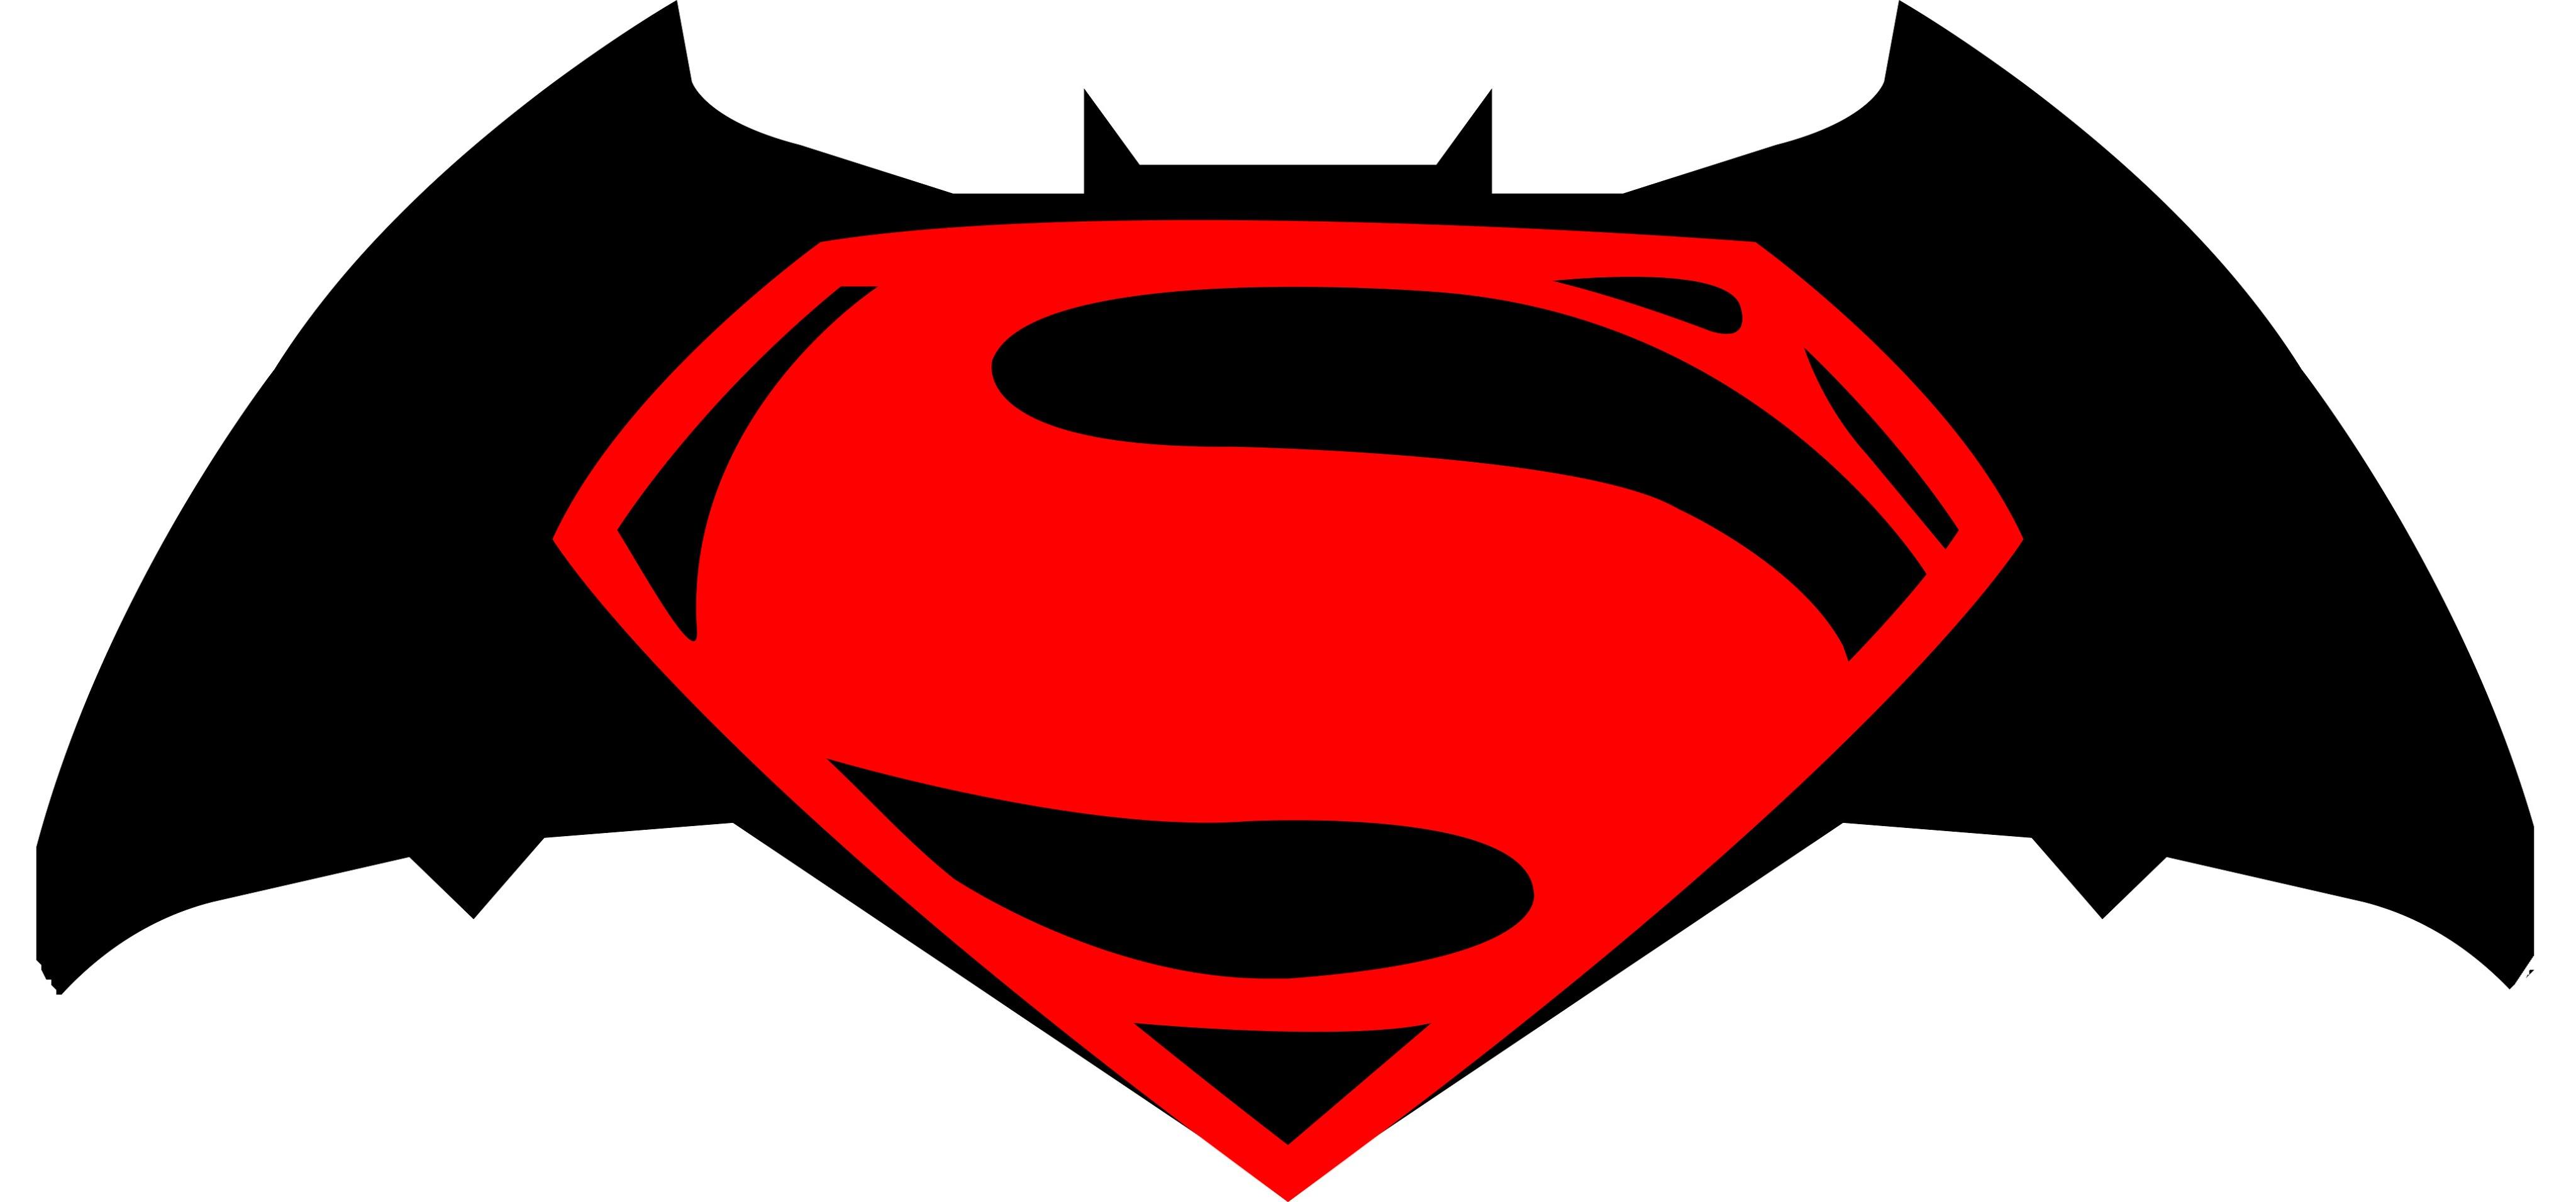 Superman drawing free download best superman drawing on 4096x1912 drawing logos buycottarizona